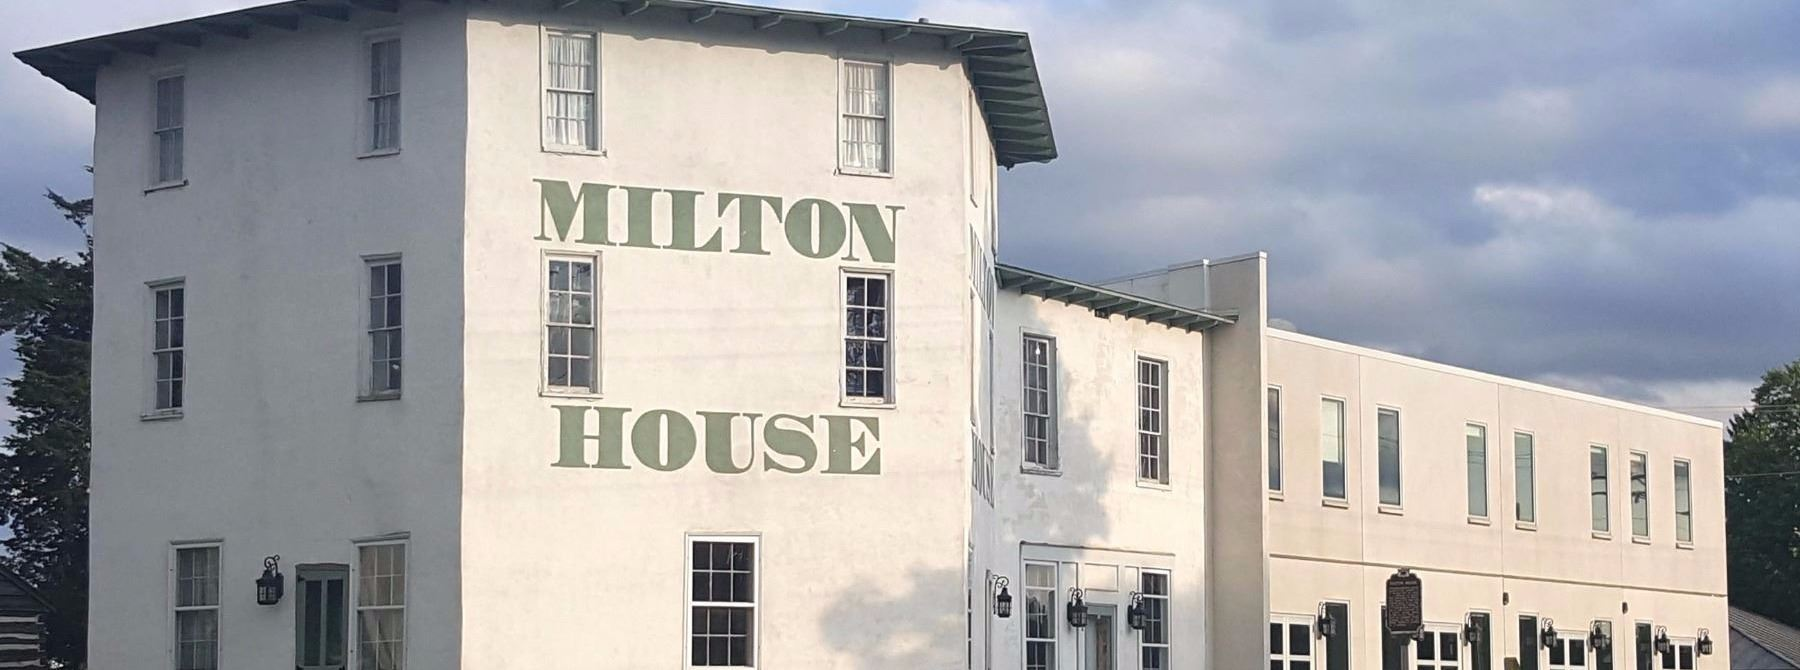 Municipal Court   Milton, WI - Official Website